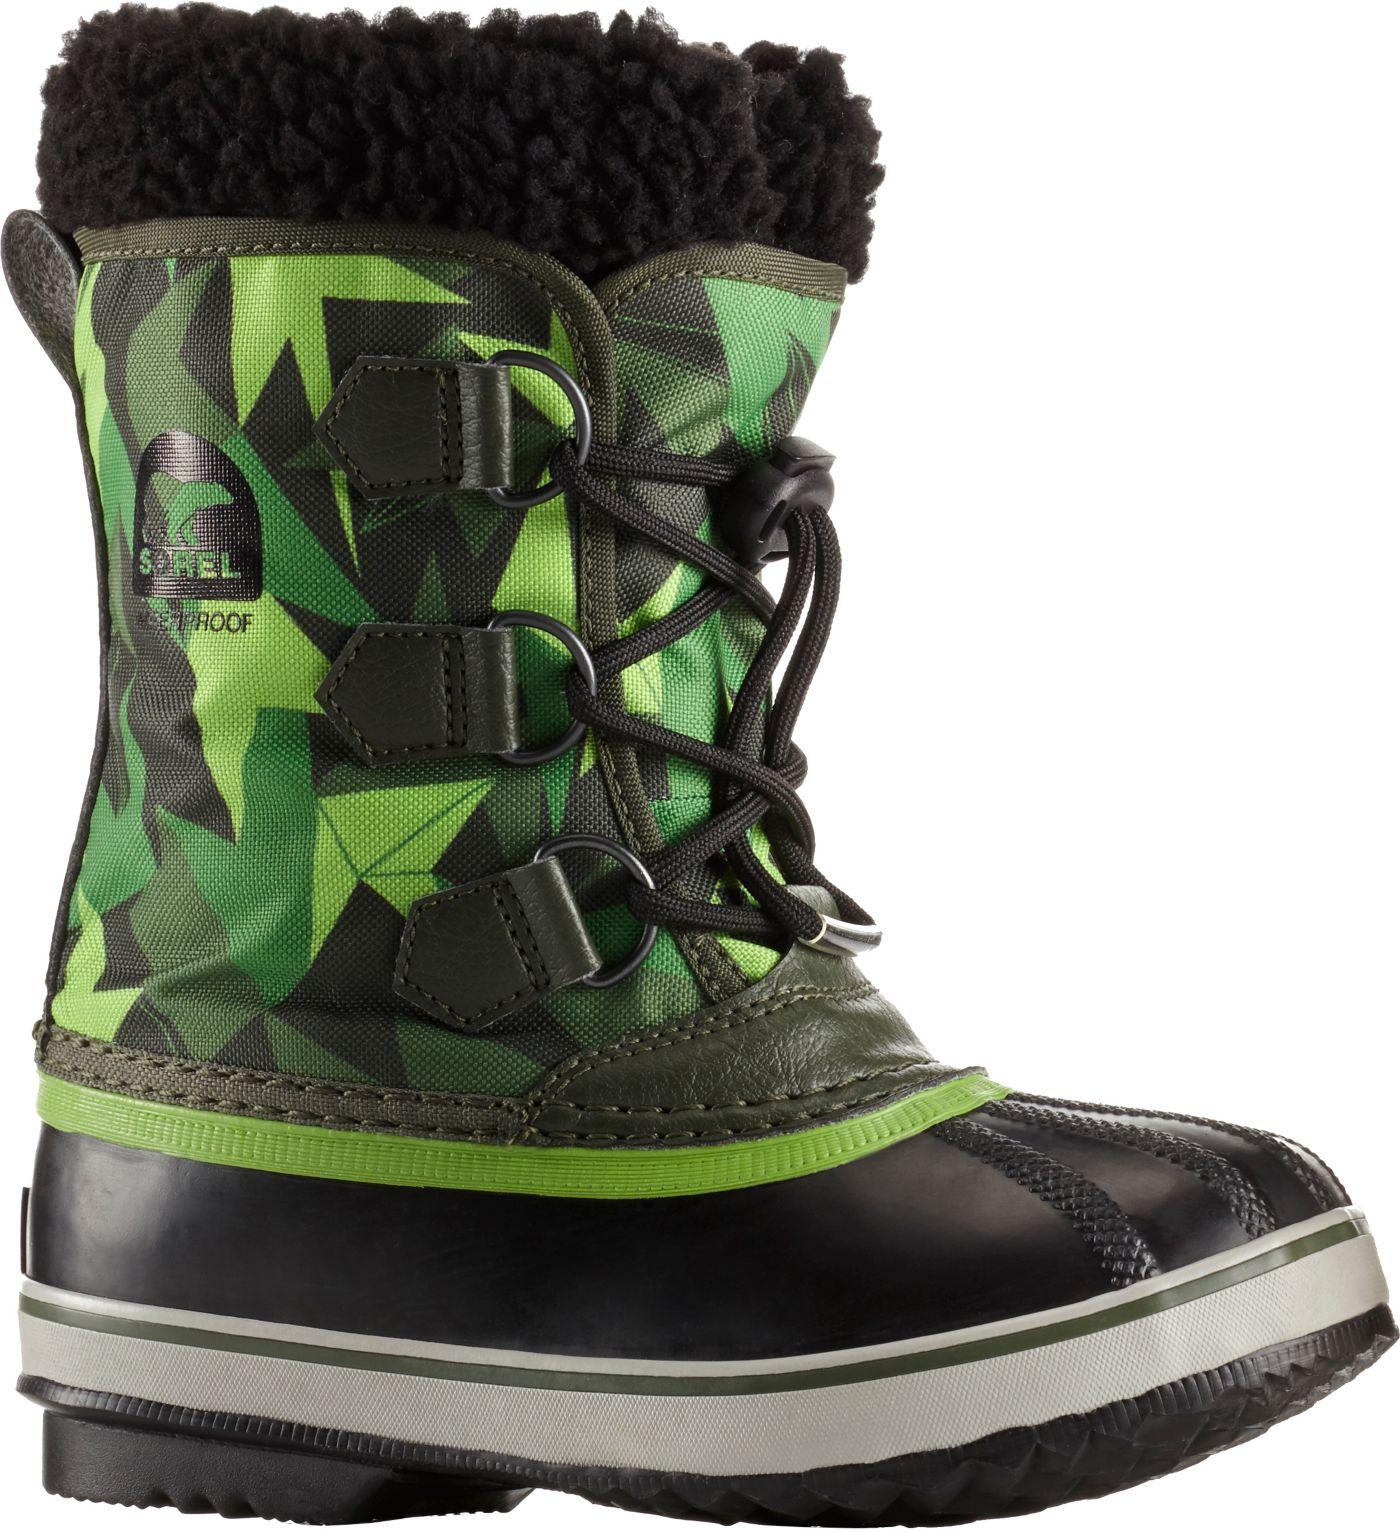 SOREL Kids' Yoot Pac Waterproof Winter Boots